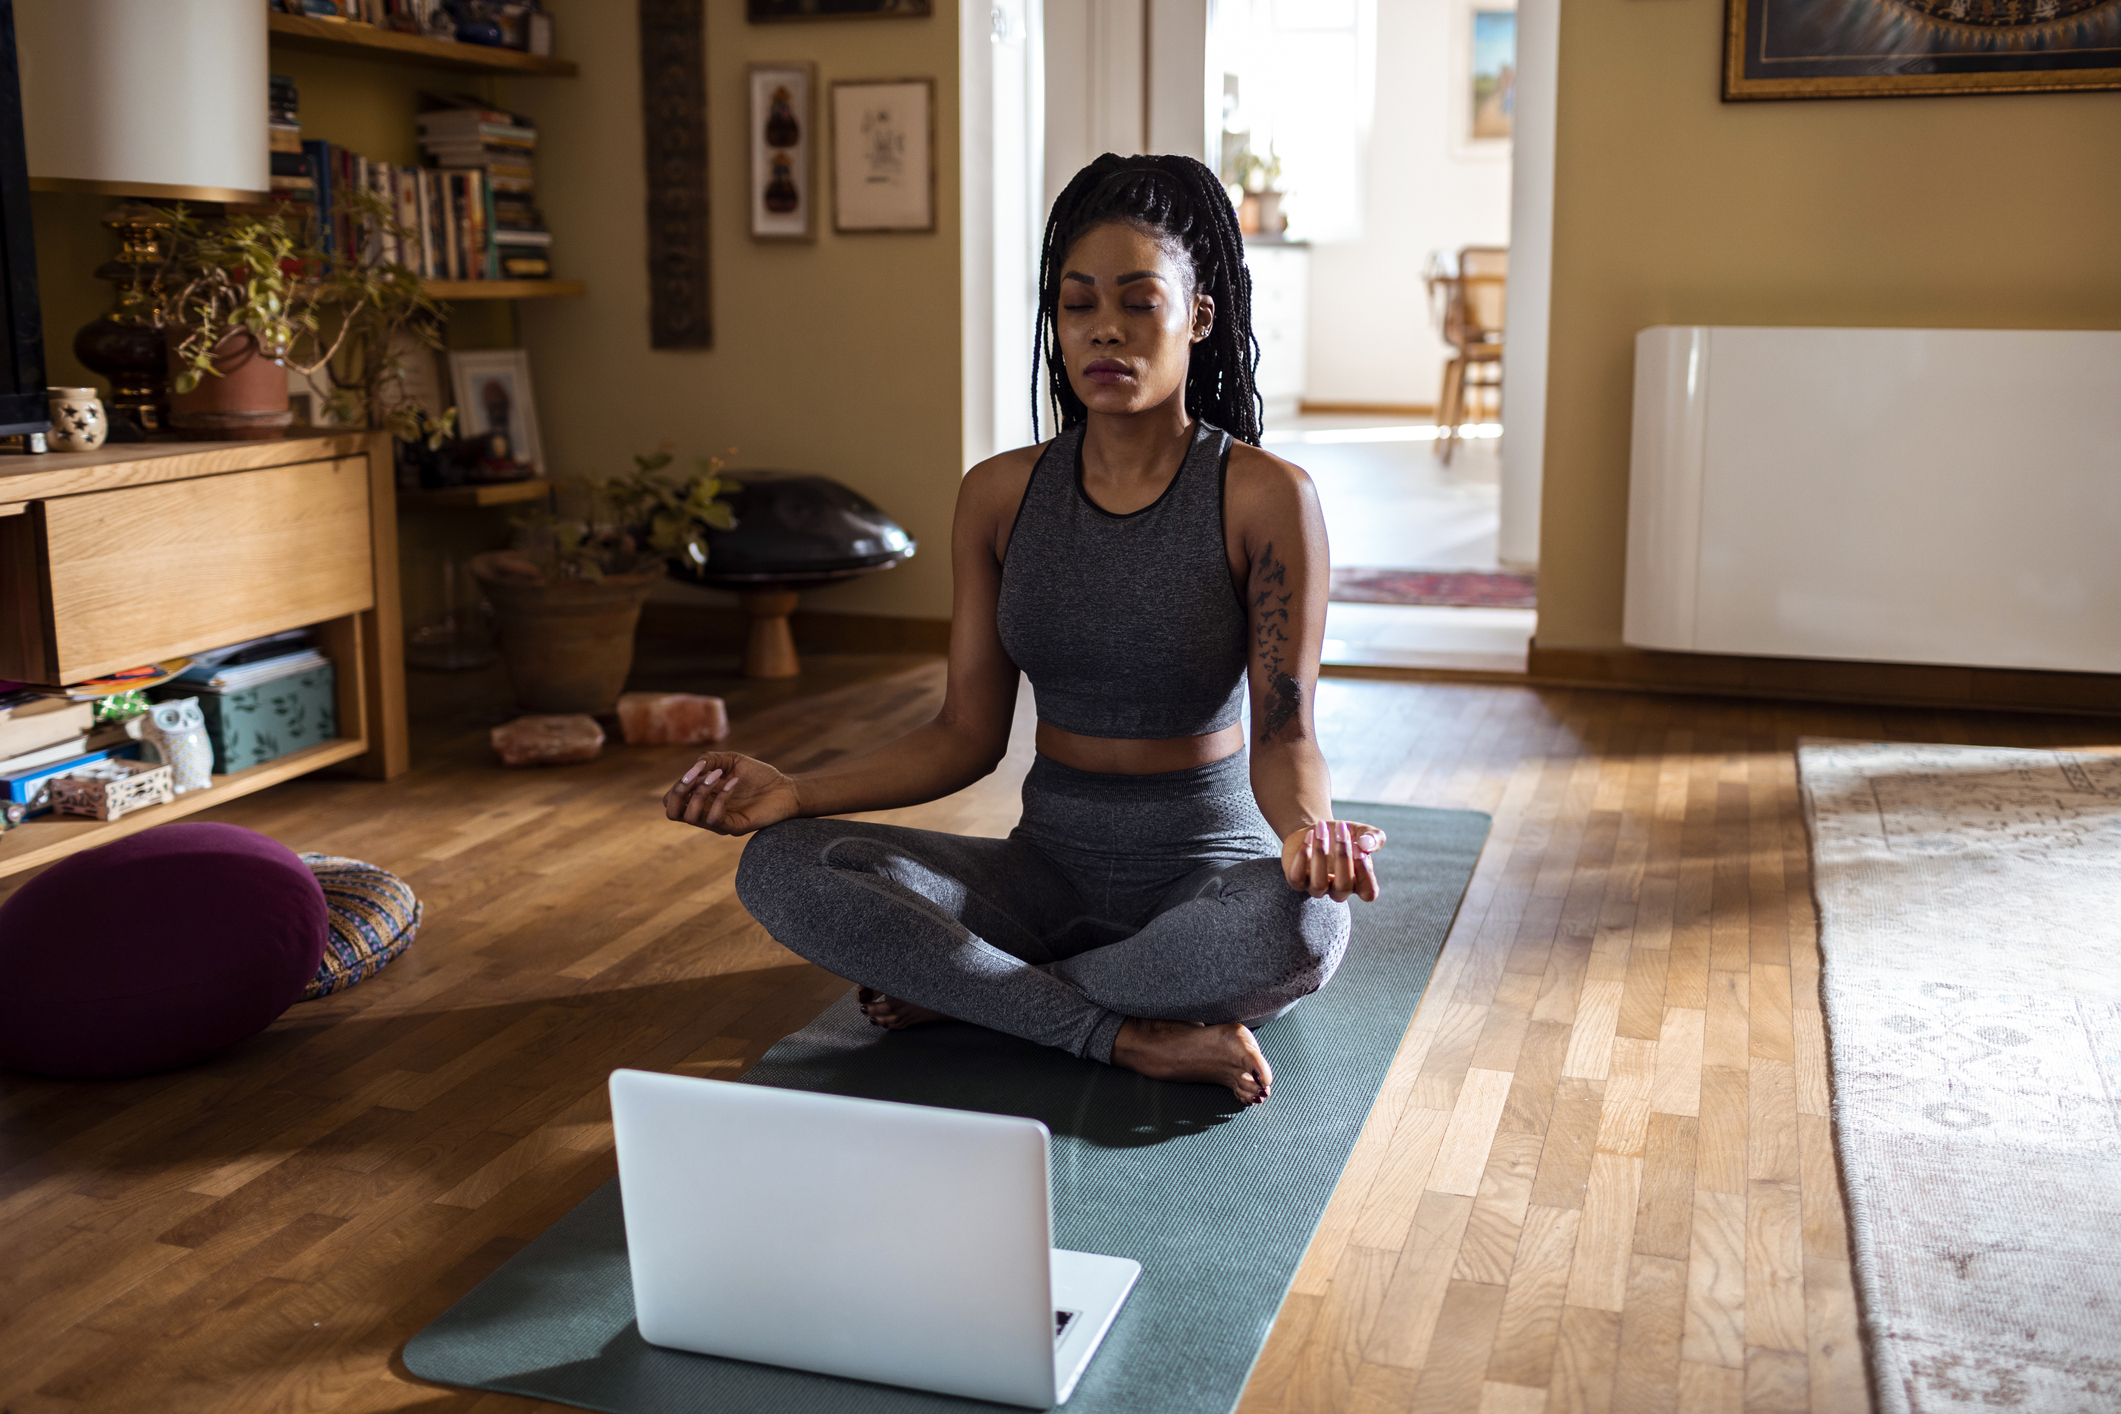 Close up of a young woman meditating at home.